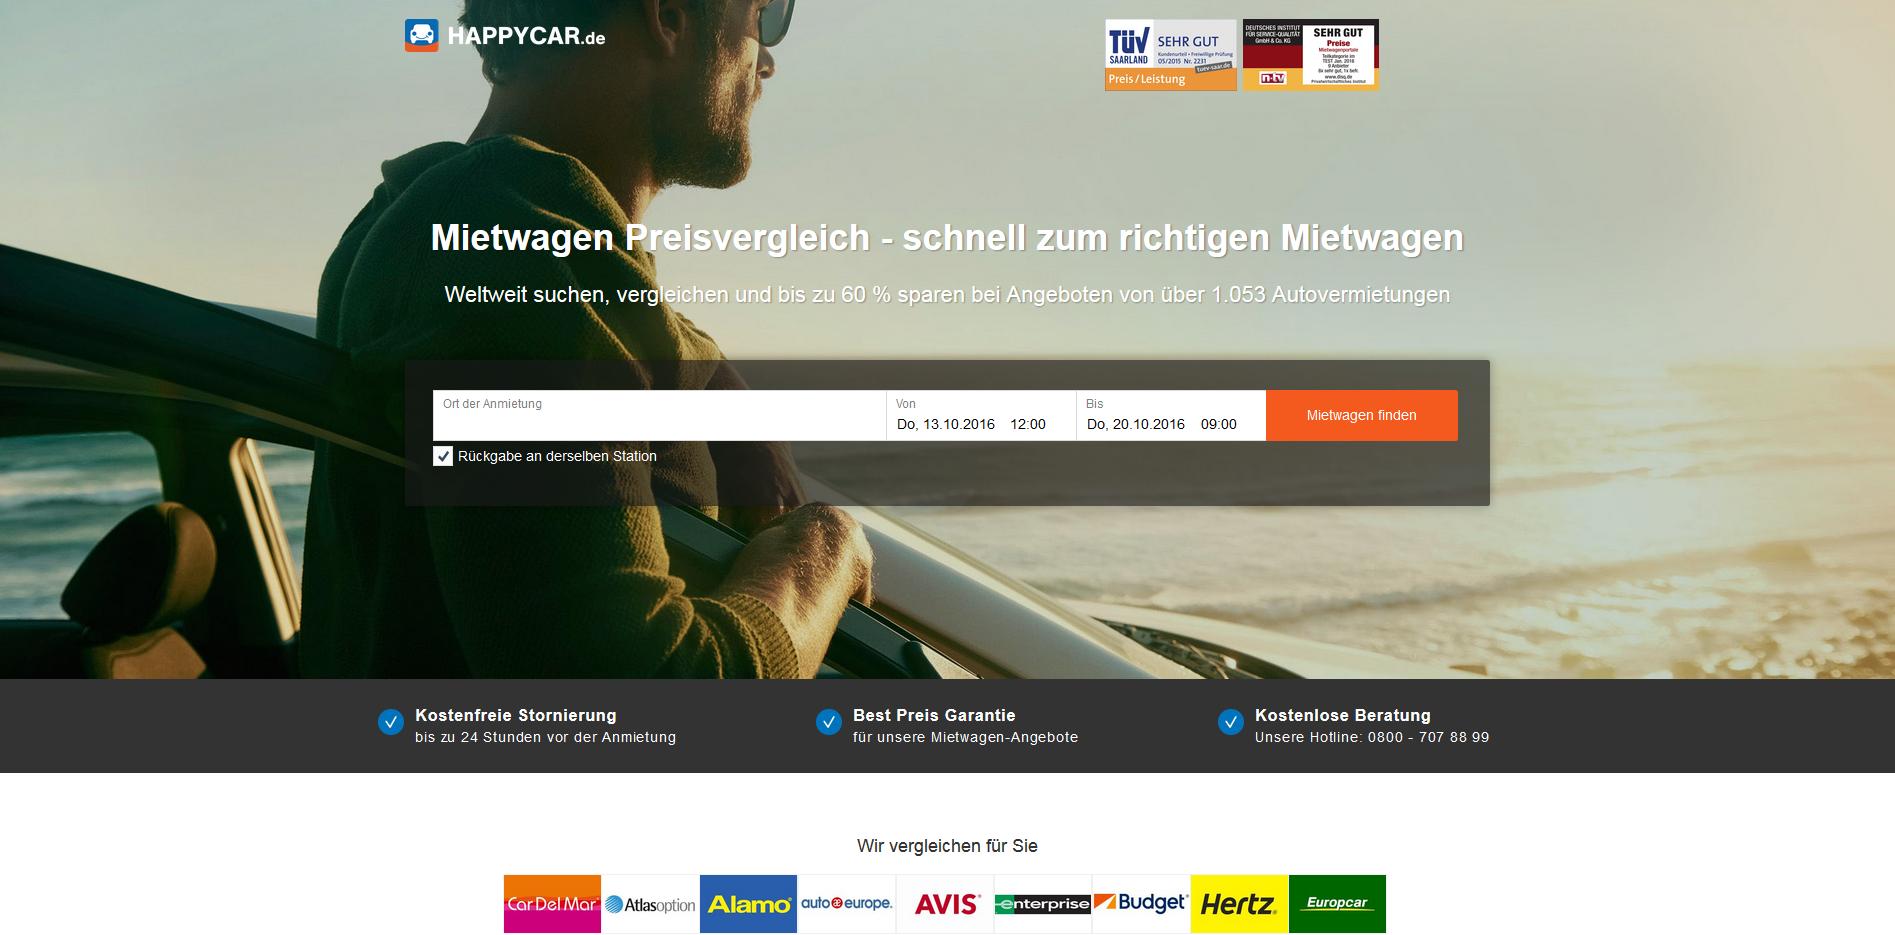 Car Rental Websites >> Car Rental Comparison Site Happycar Picks Up 2 6m Funding